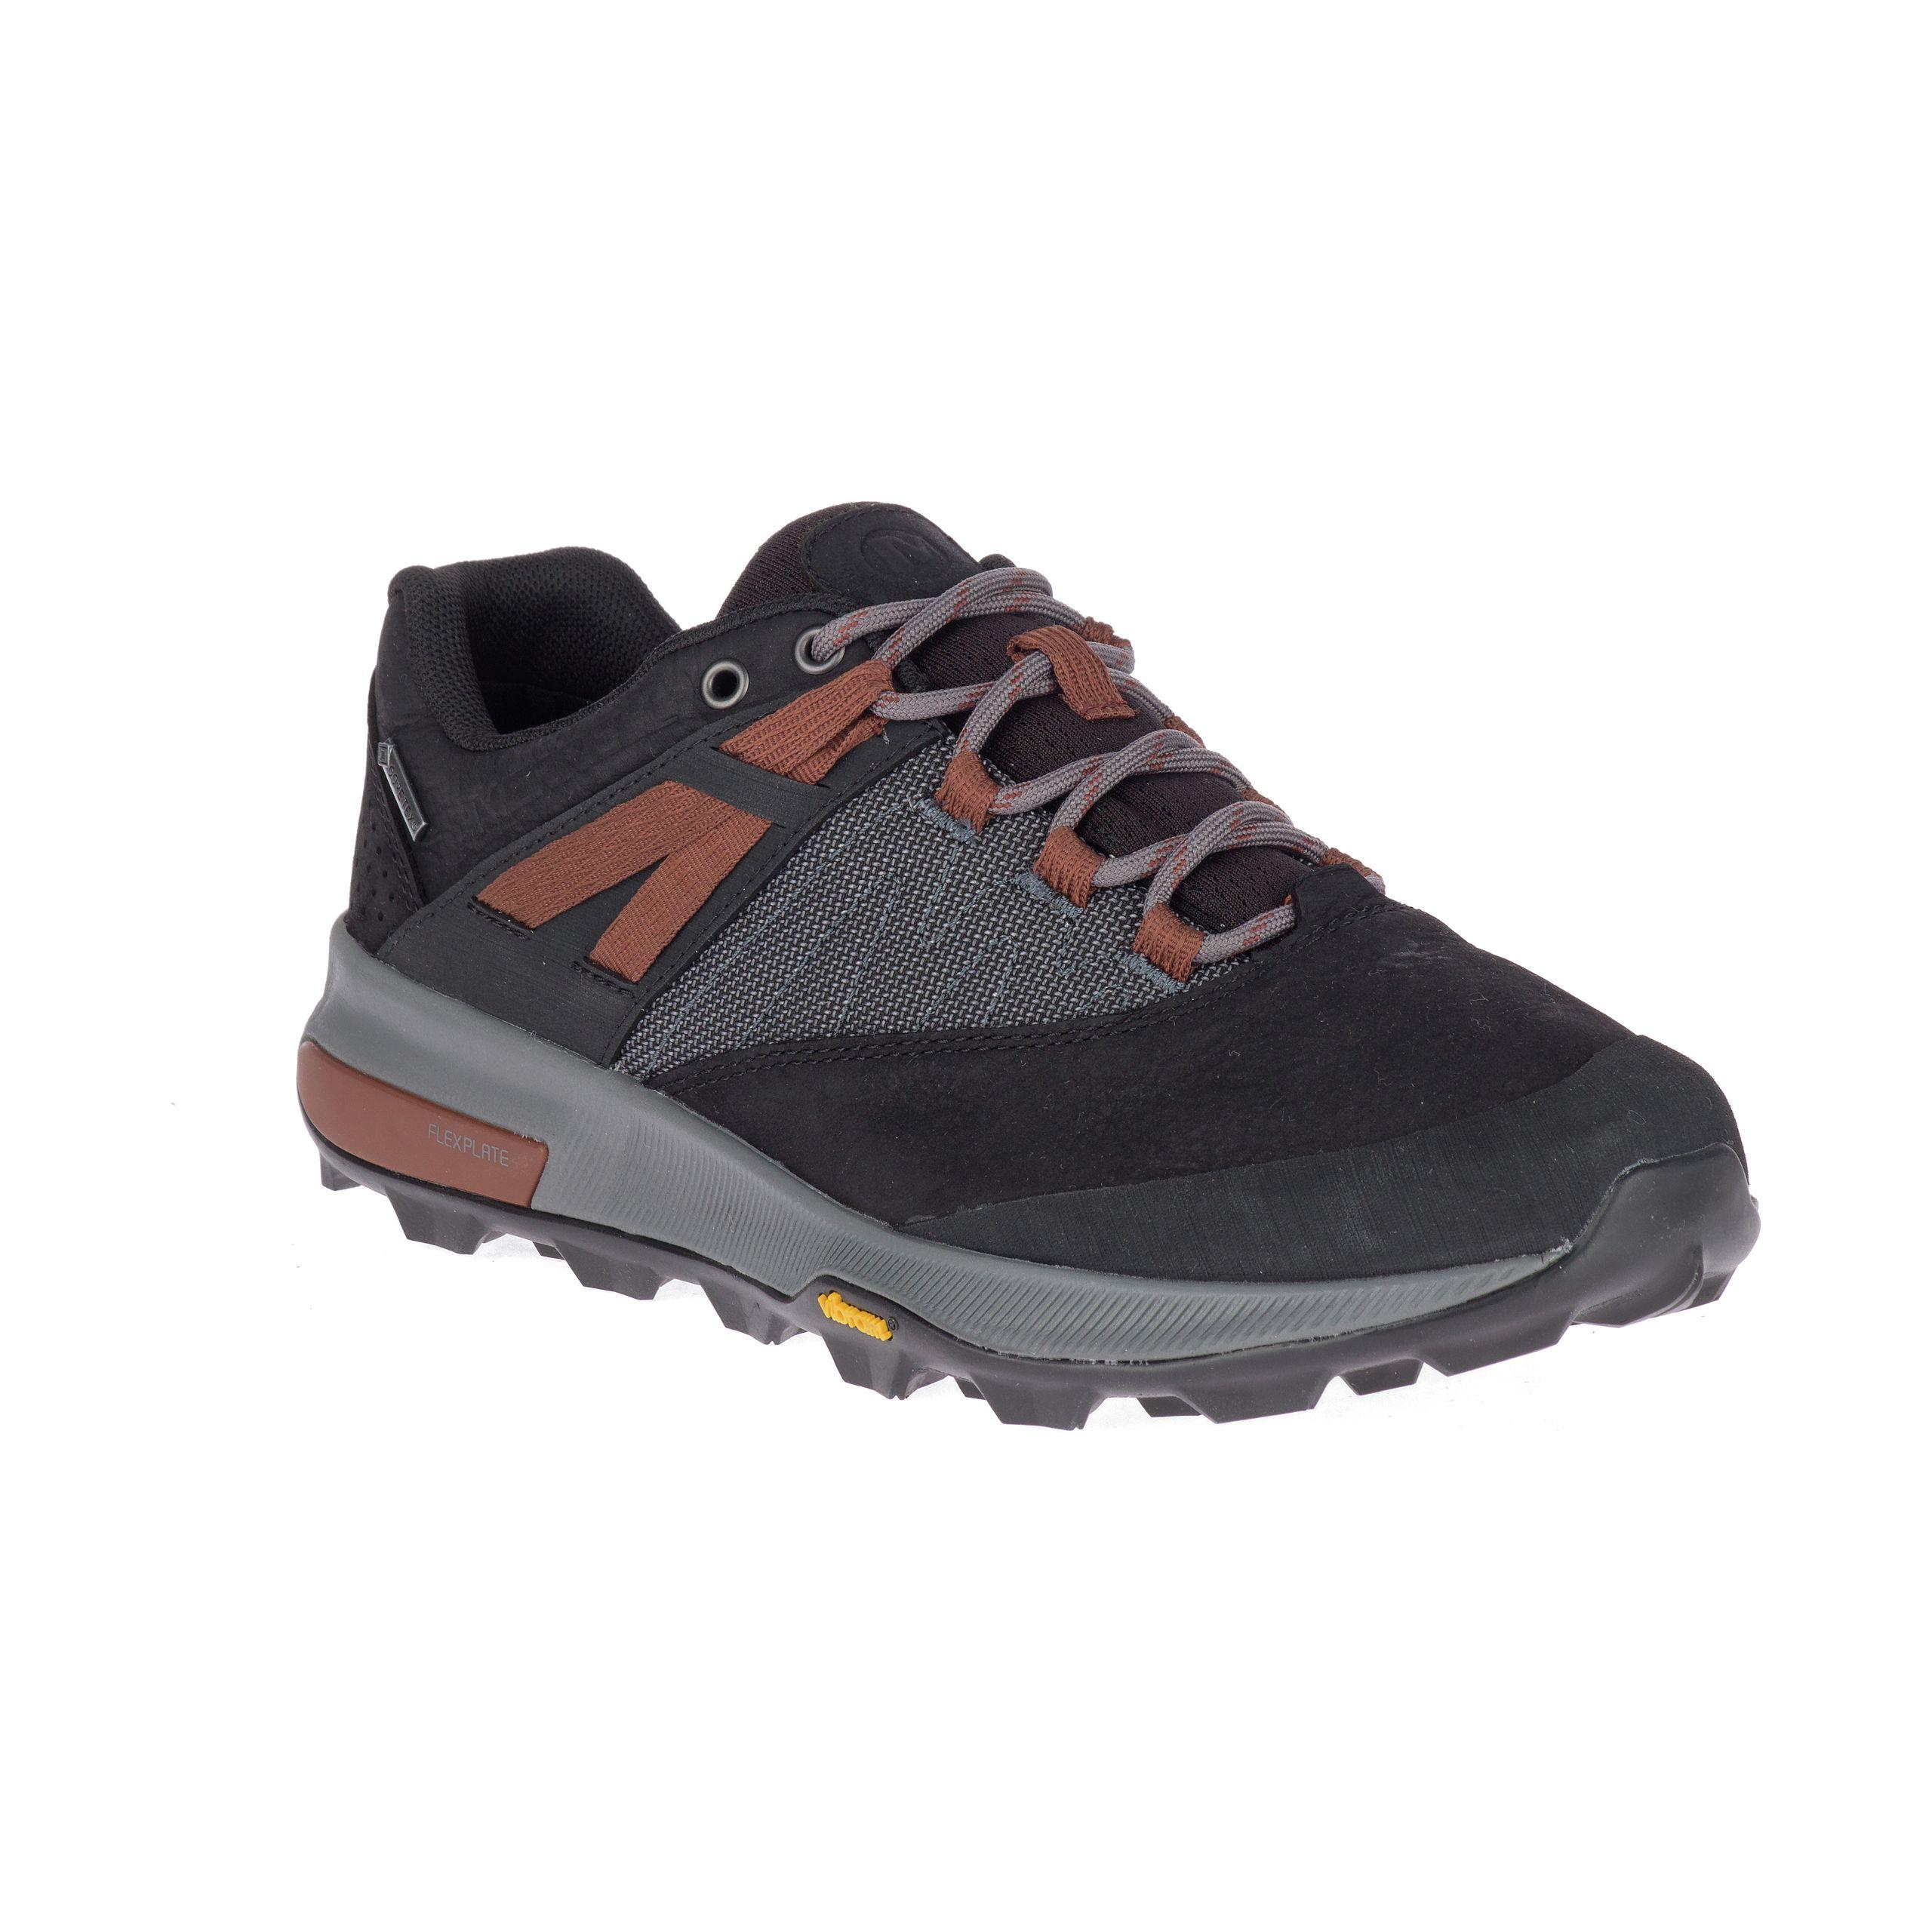 Merrell Womens Zion Gore-tex Walking Shoes